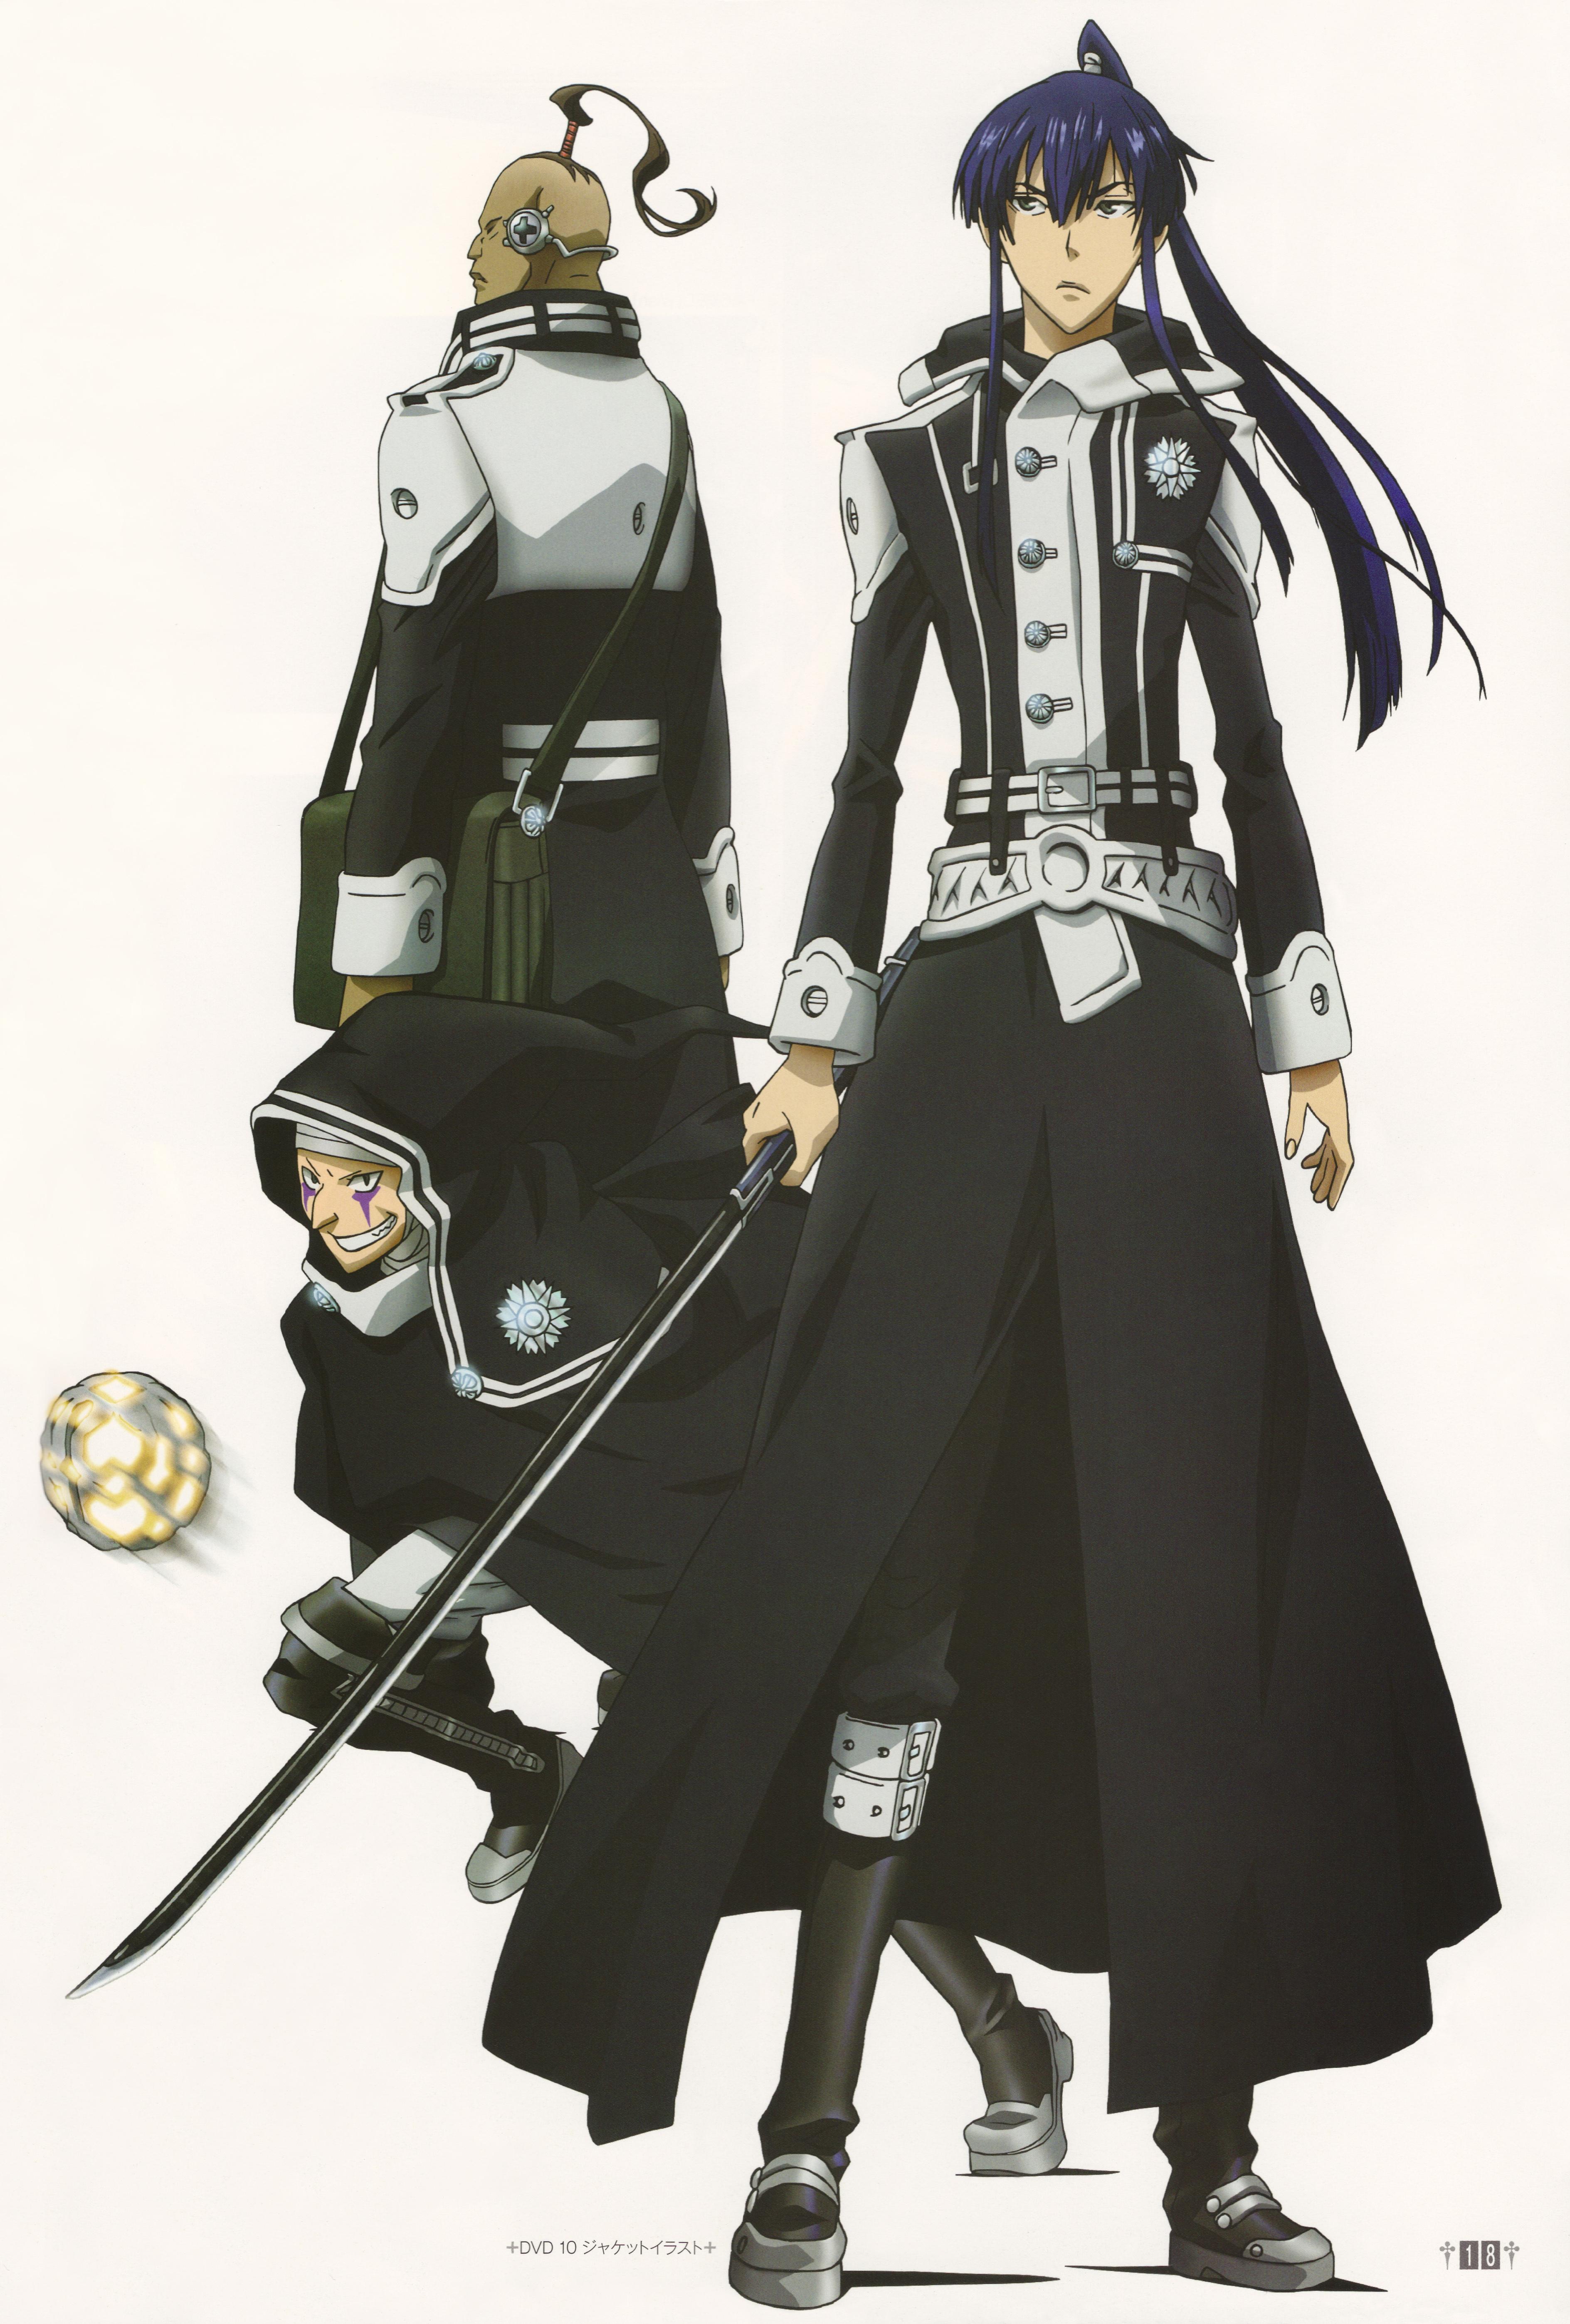 Daisya Barry - Zerochan Anime Image Board